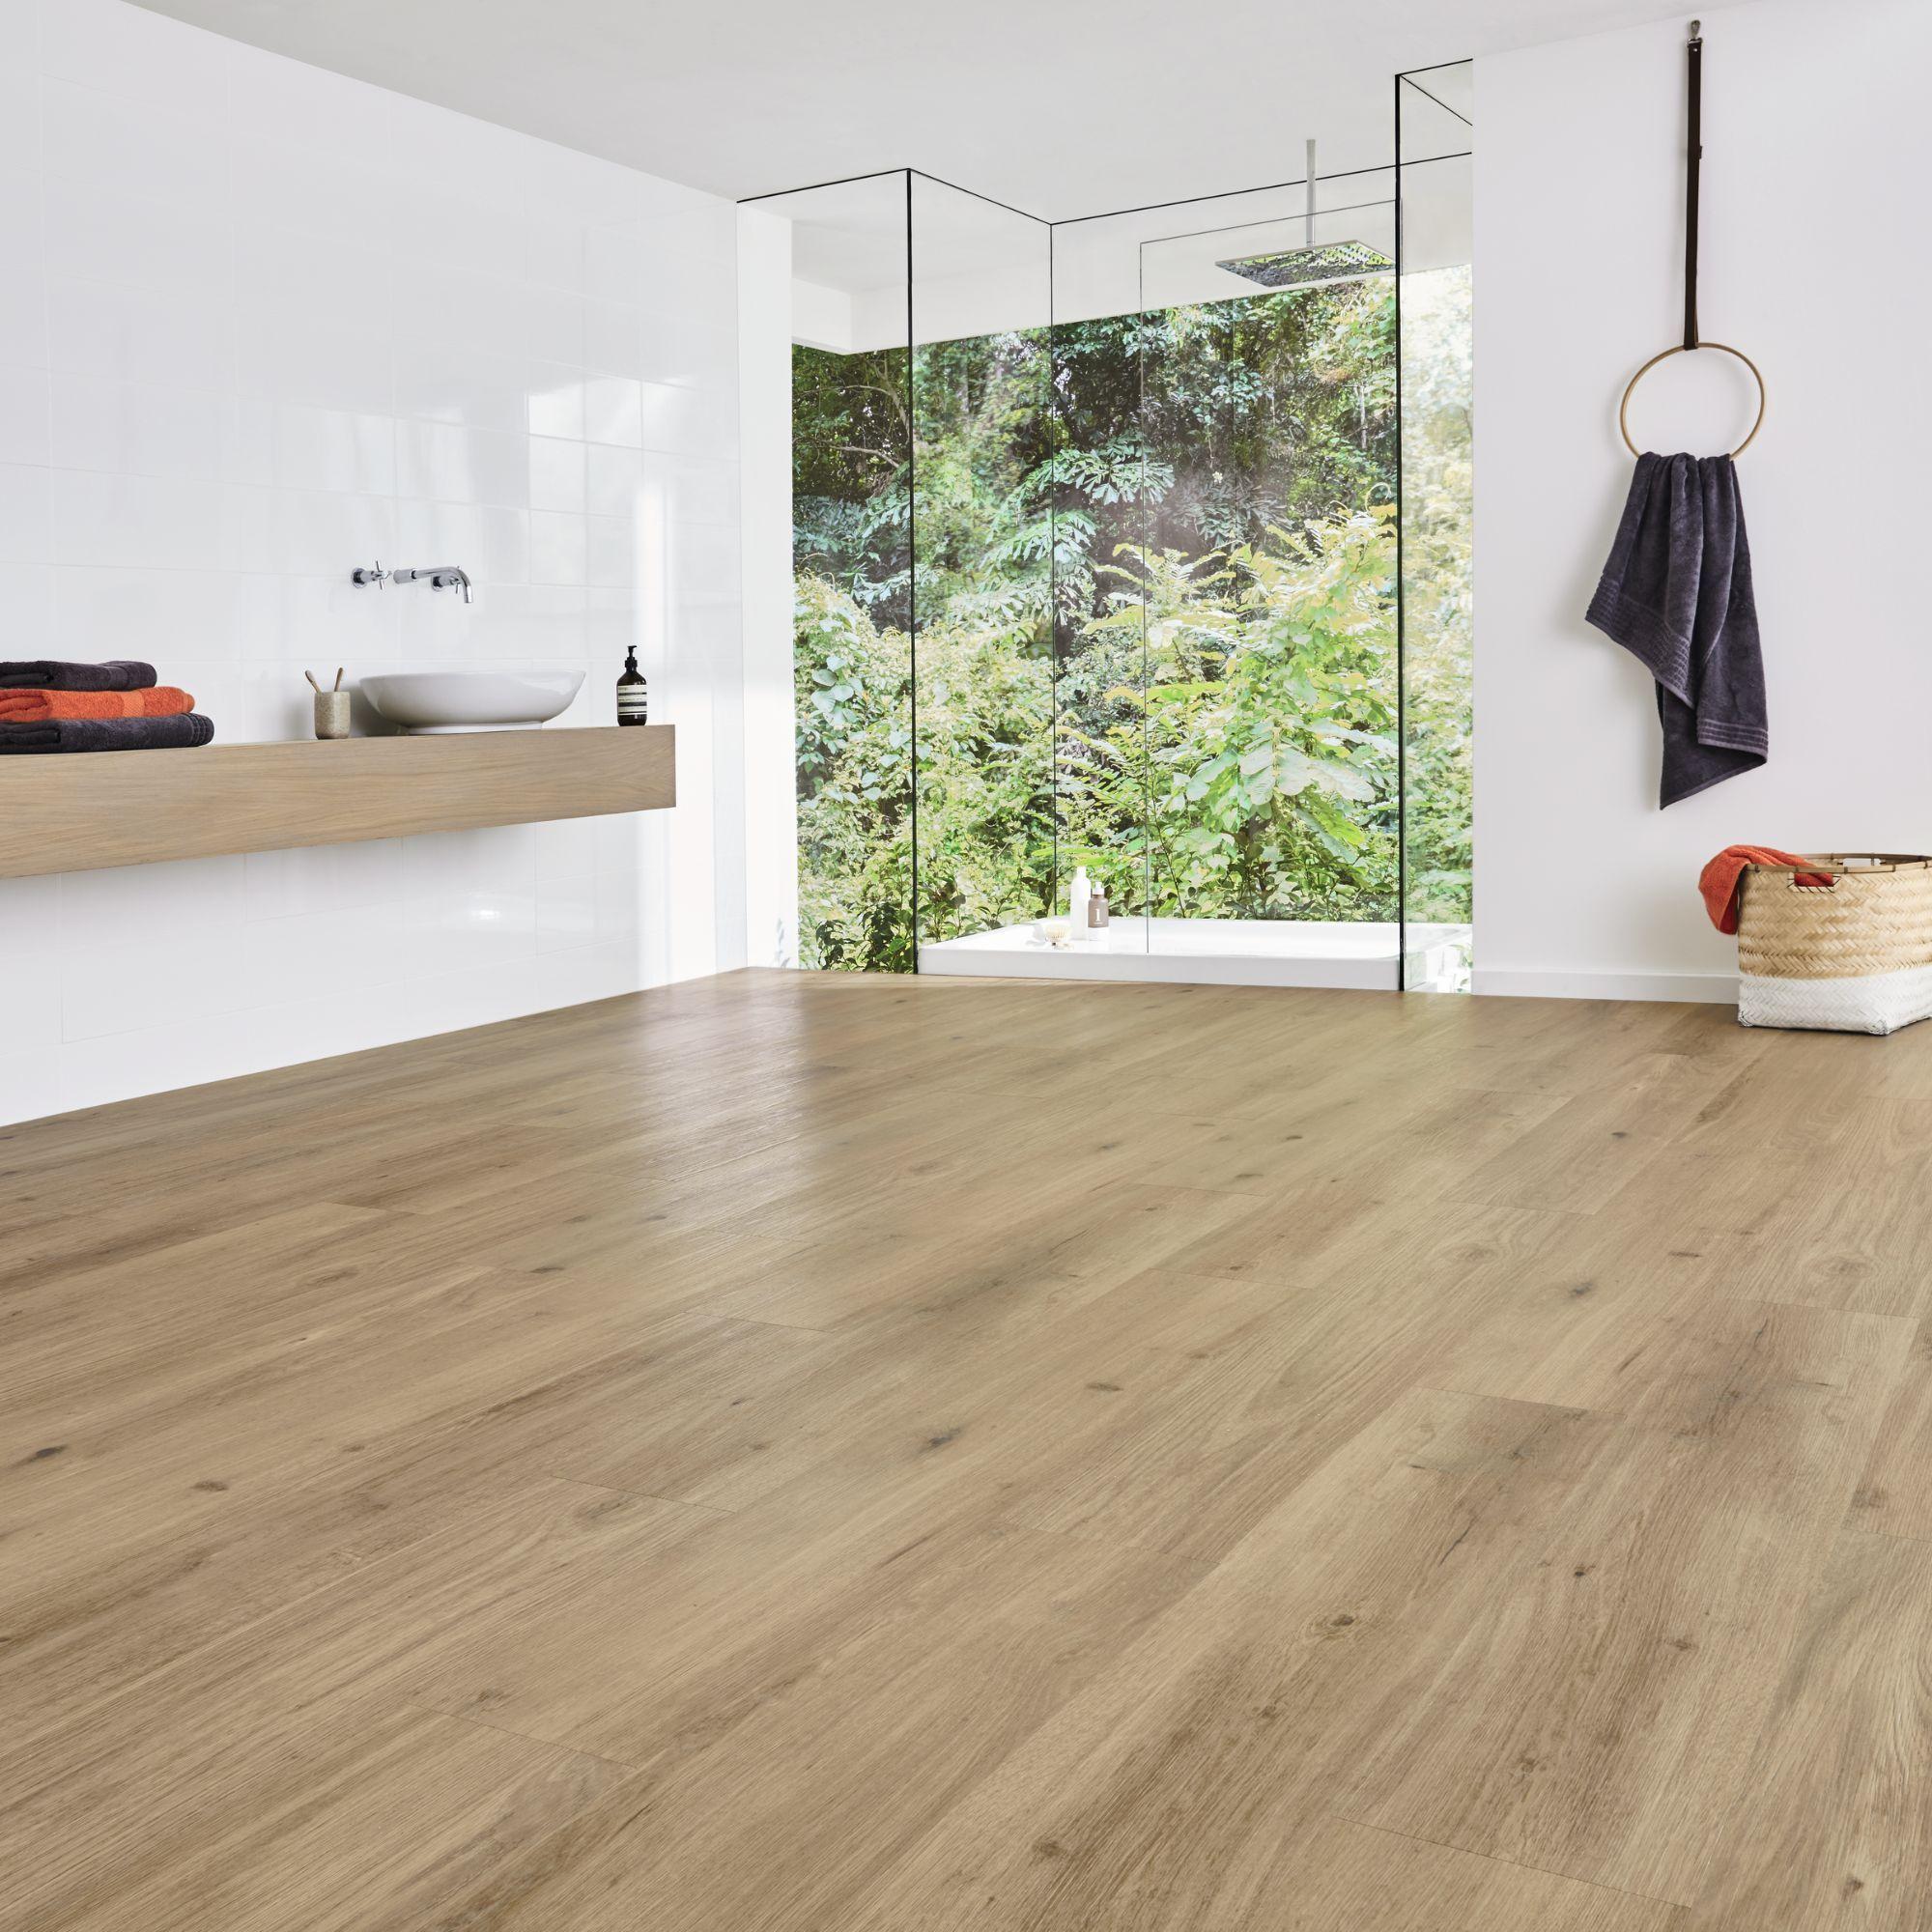 Karndean Korlok Rigid Core LVT Click Flooring in 2020